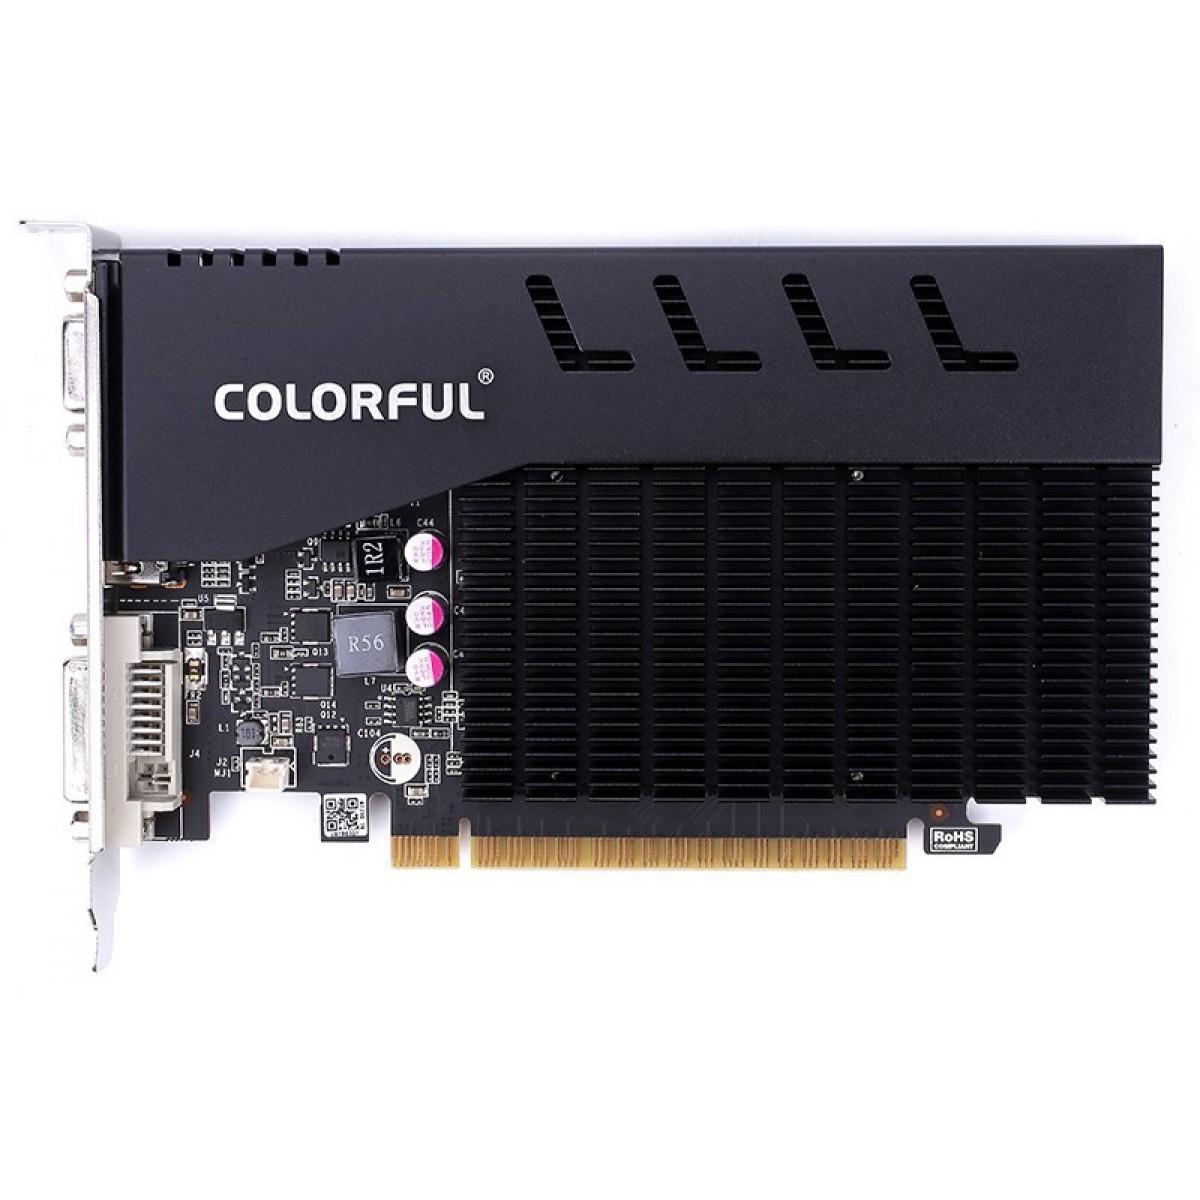 Placa de Vídeo Colorful GeForce GT 710, 1GB GDDR3, 64Bit, 212327093802